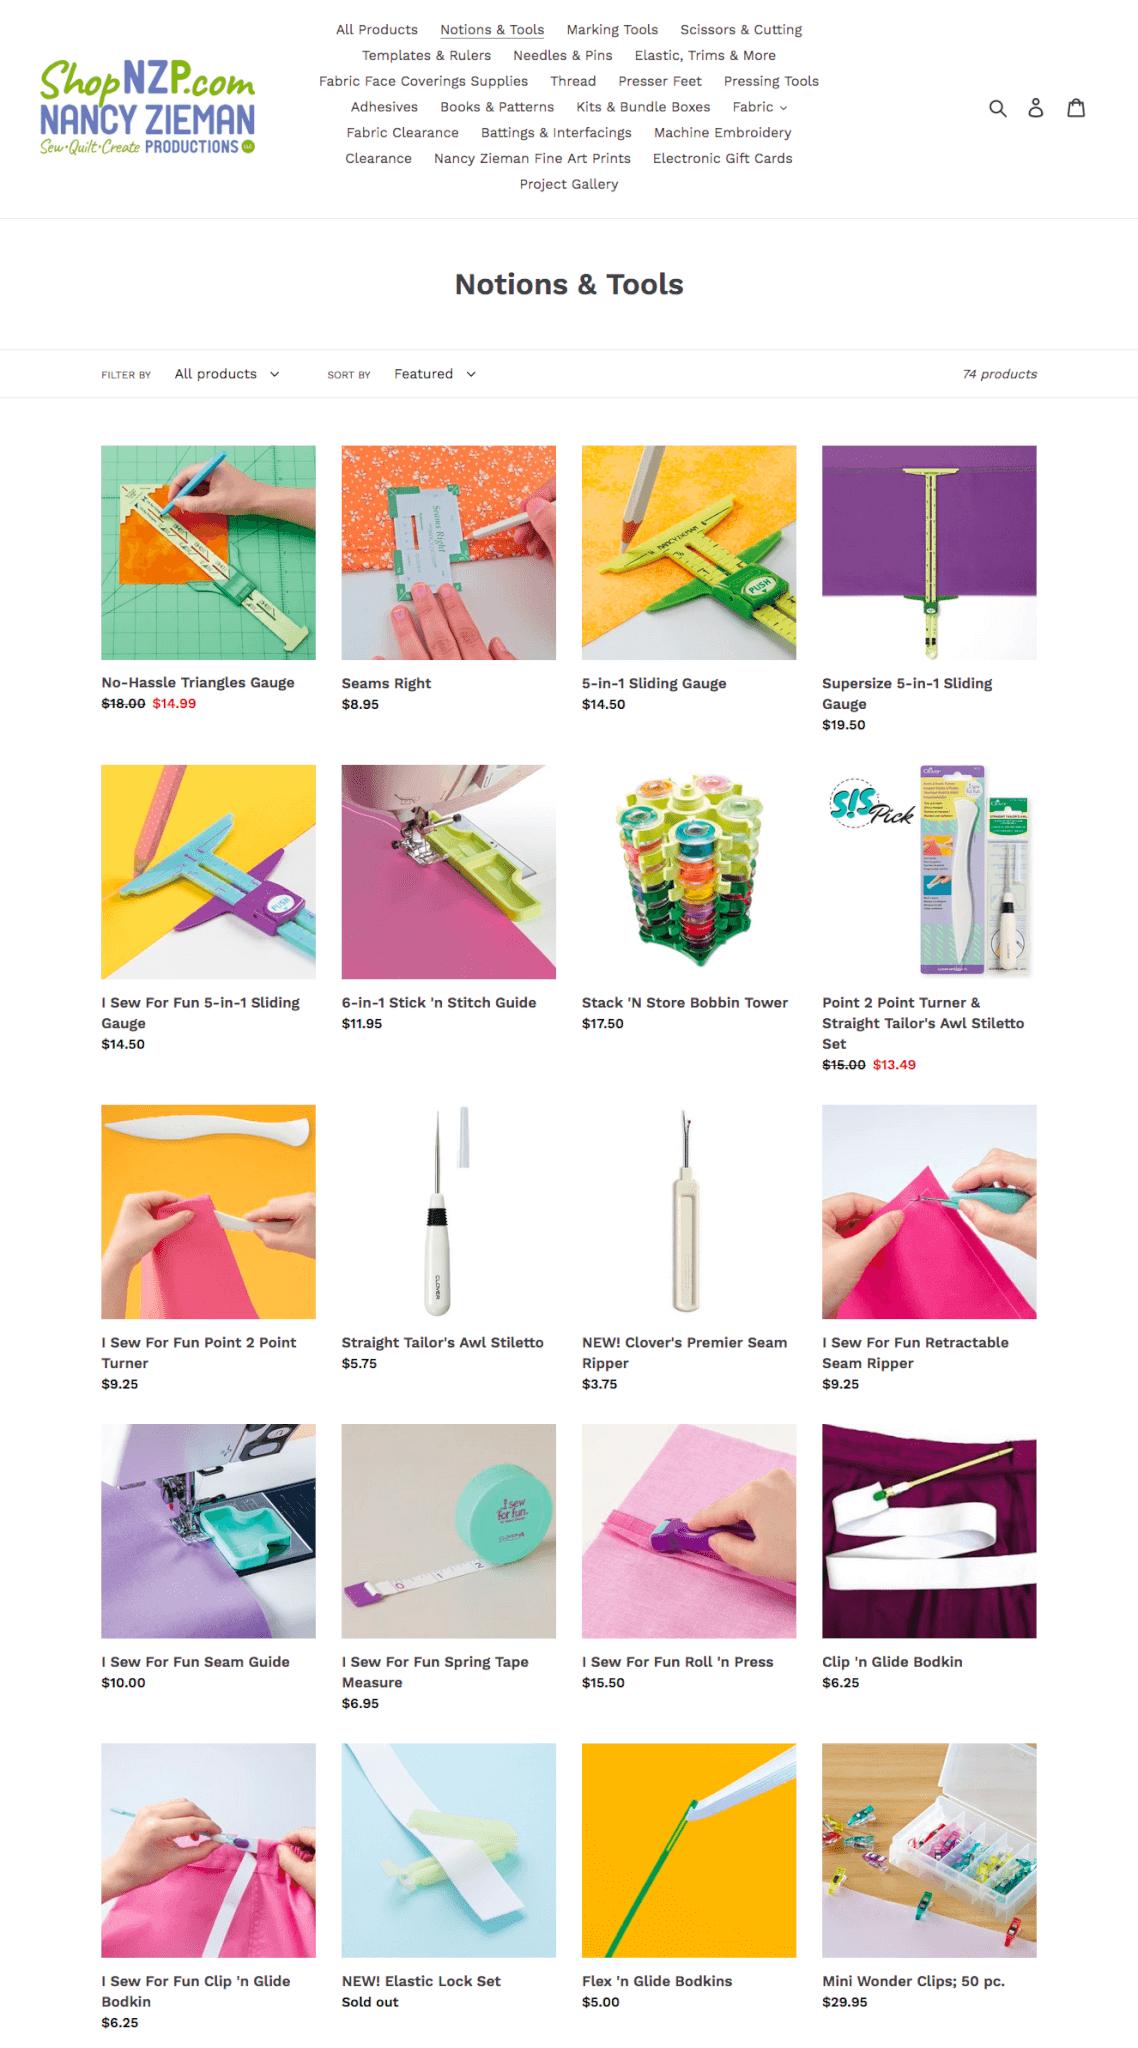 Visit ShopNZP.com to Purchase Nancy Zieman's Timesaving Sewing Notions